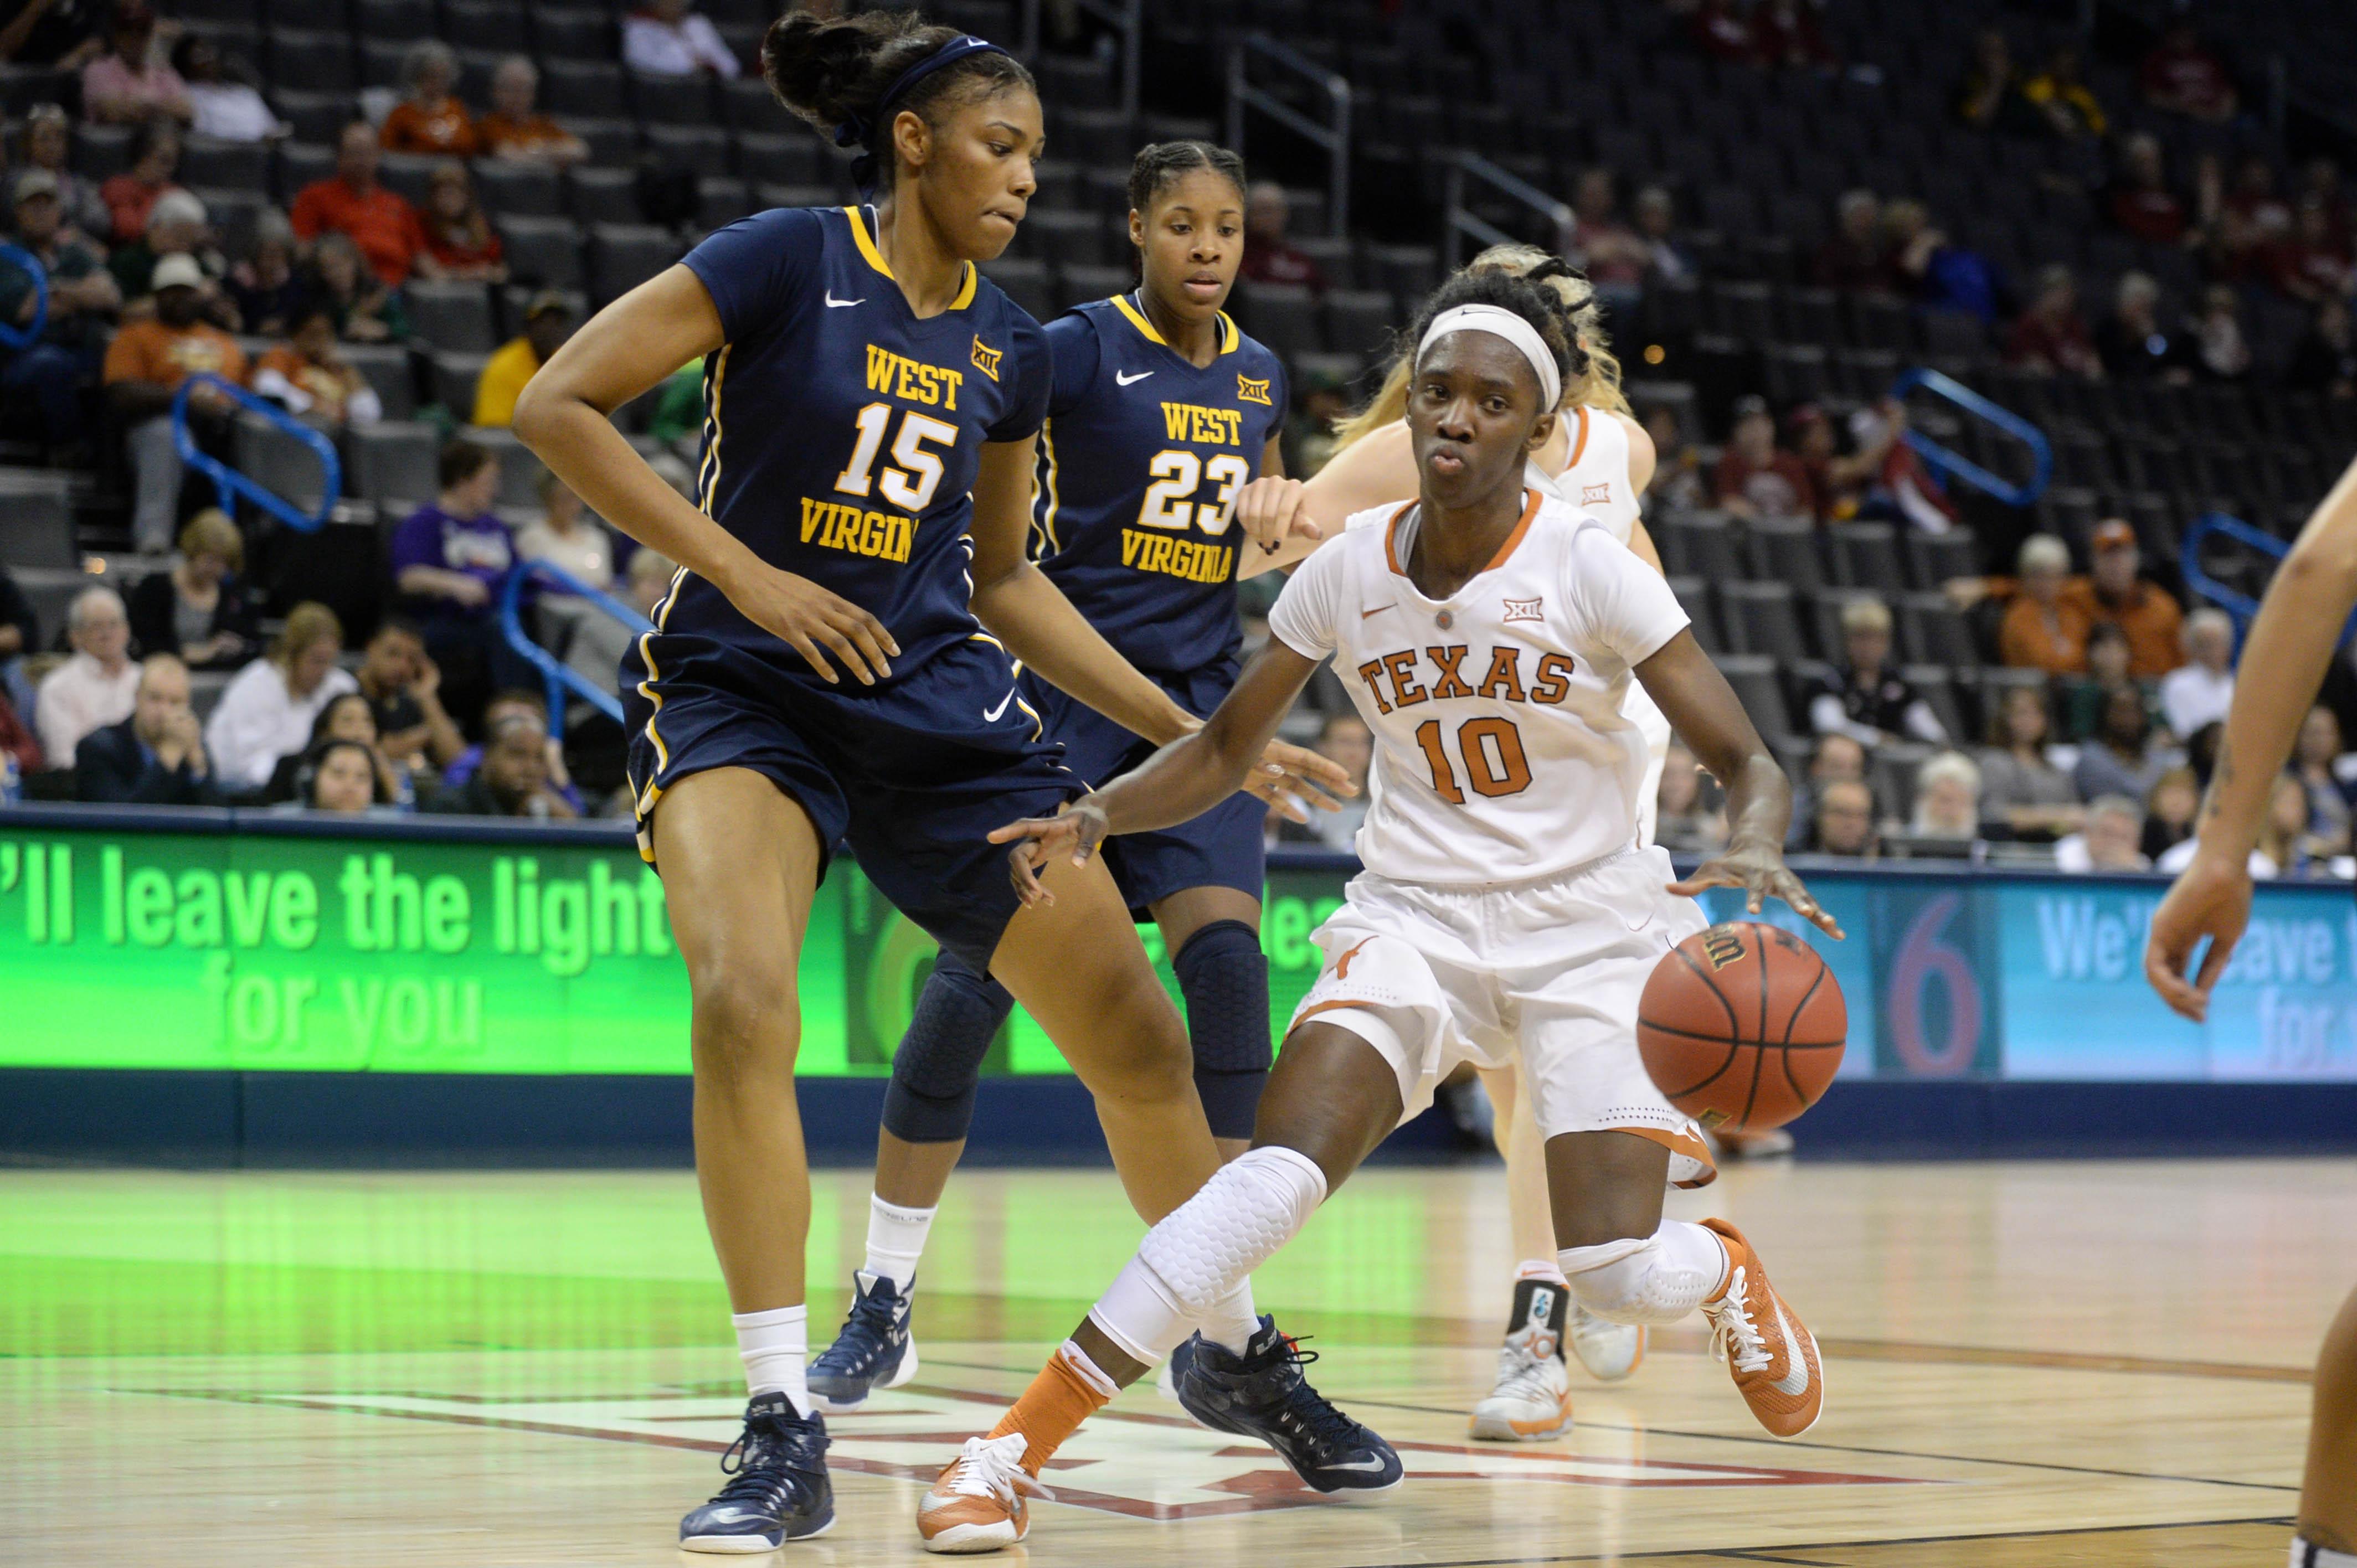 9163051-ncaa-womens-basketball-big-12-conference-tournament-texas-vs-west-virginia